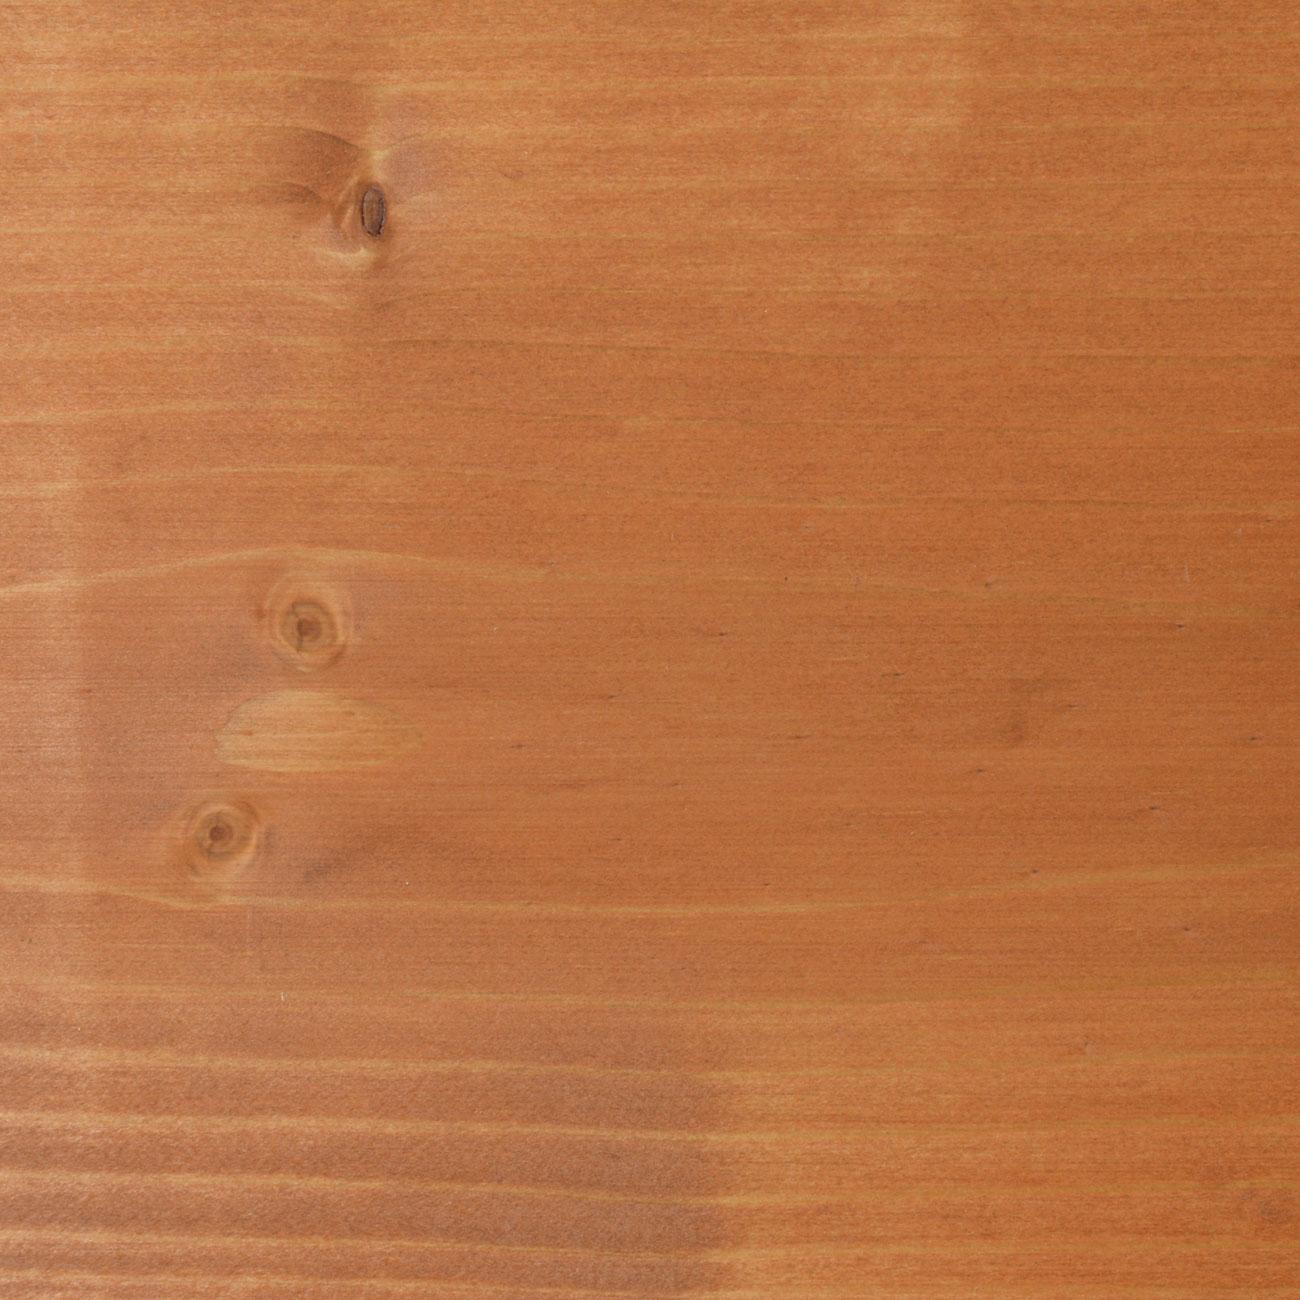 109. Fichte geschliffen mit Faxe Speziallauge zzgl. 5% Faxe Combicolor Mahagoni gelaugt und mit Faxe Holzbodenöl natur geöltöl